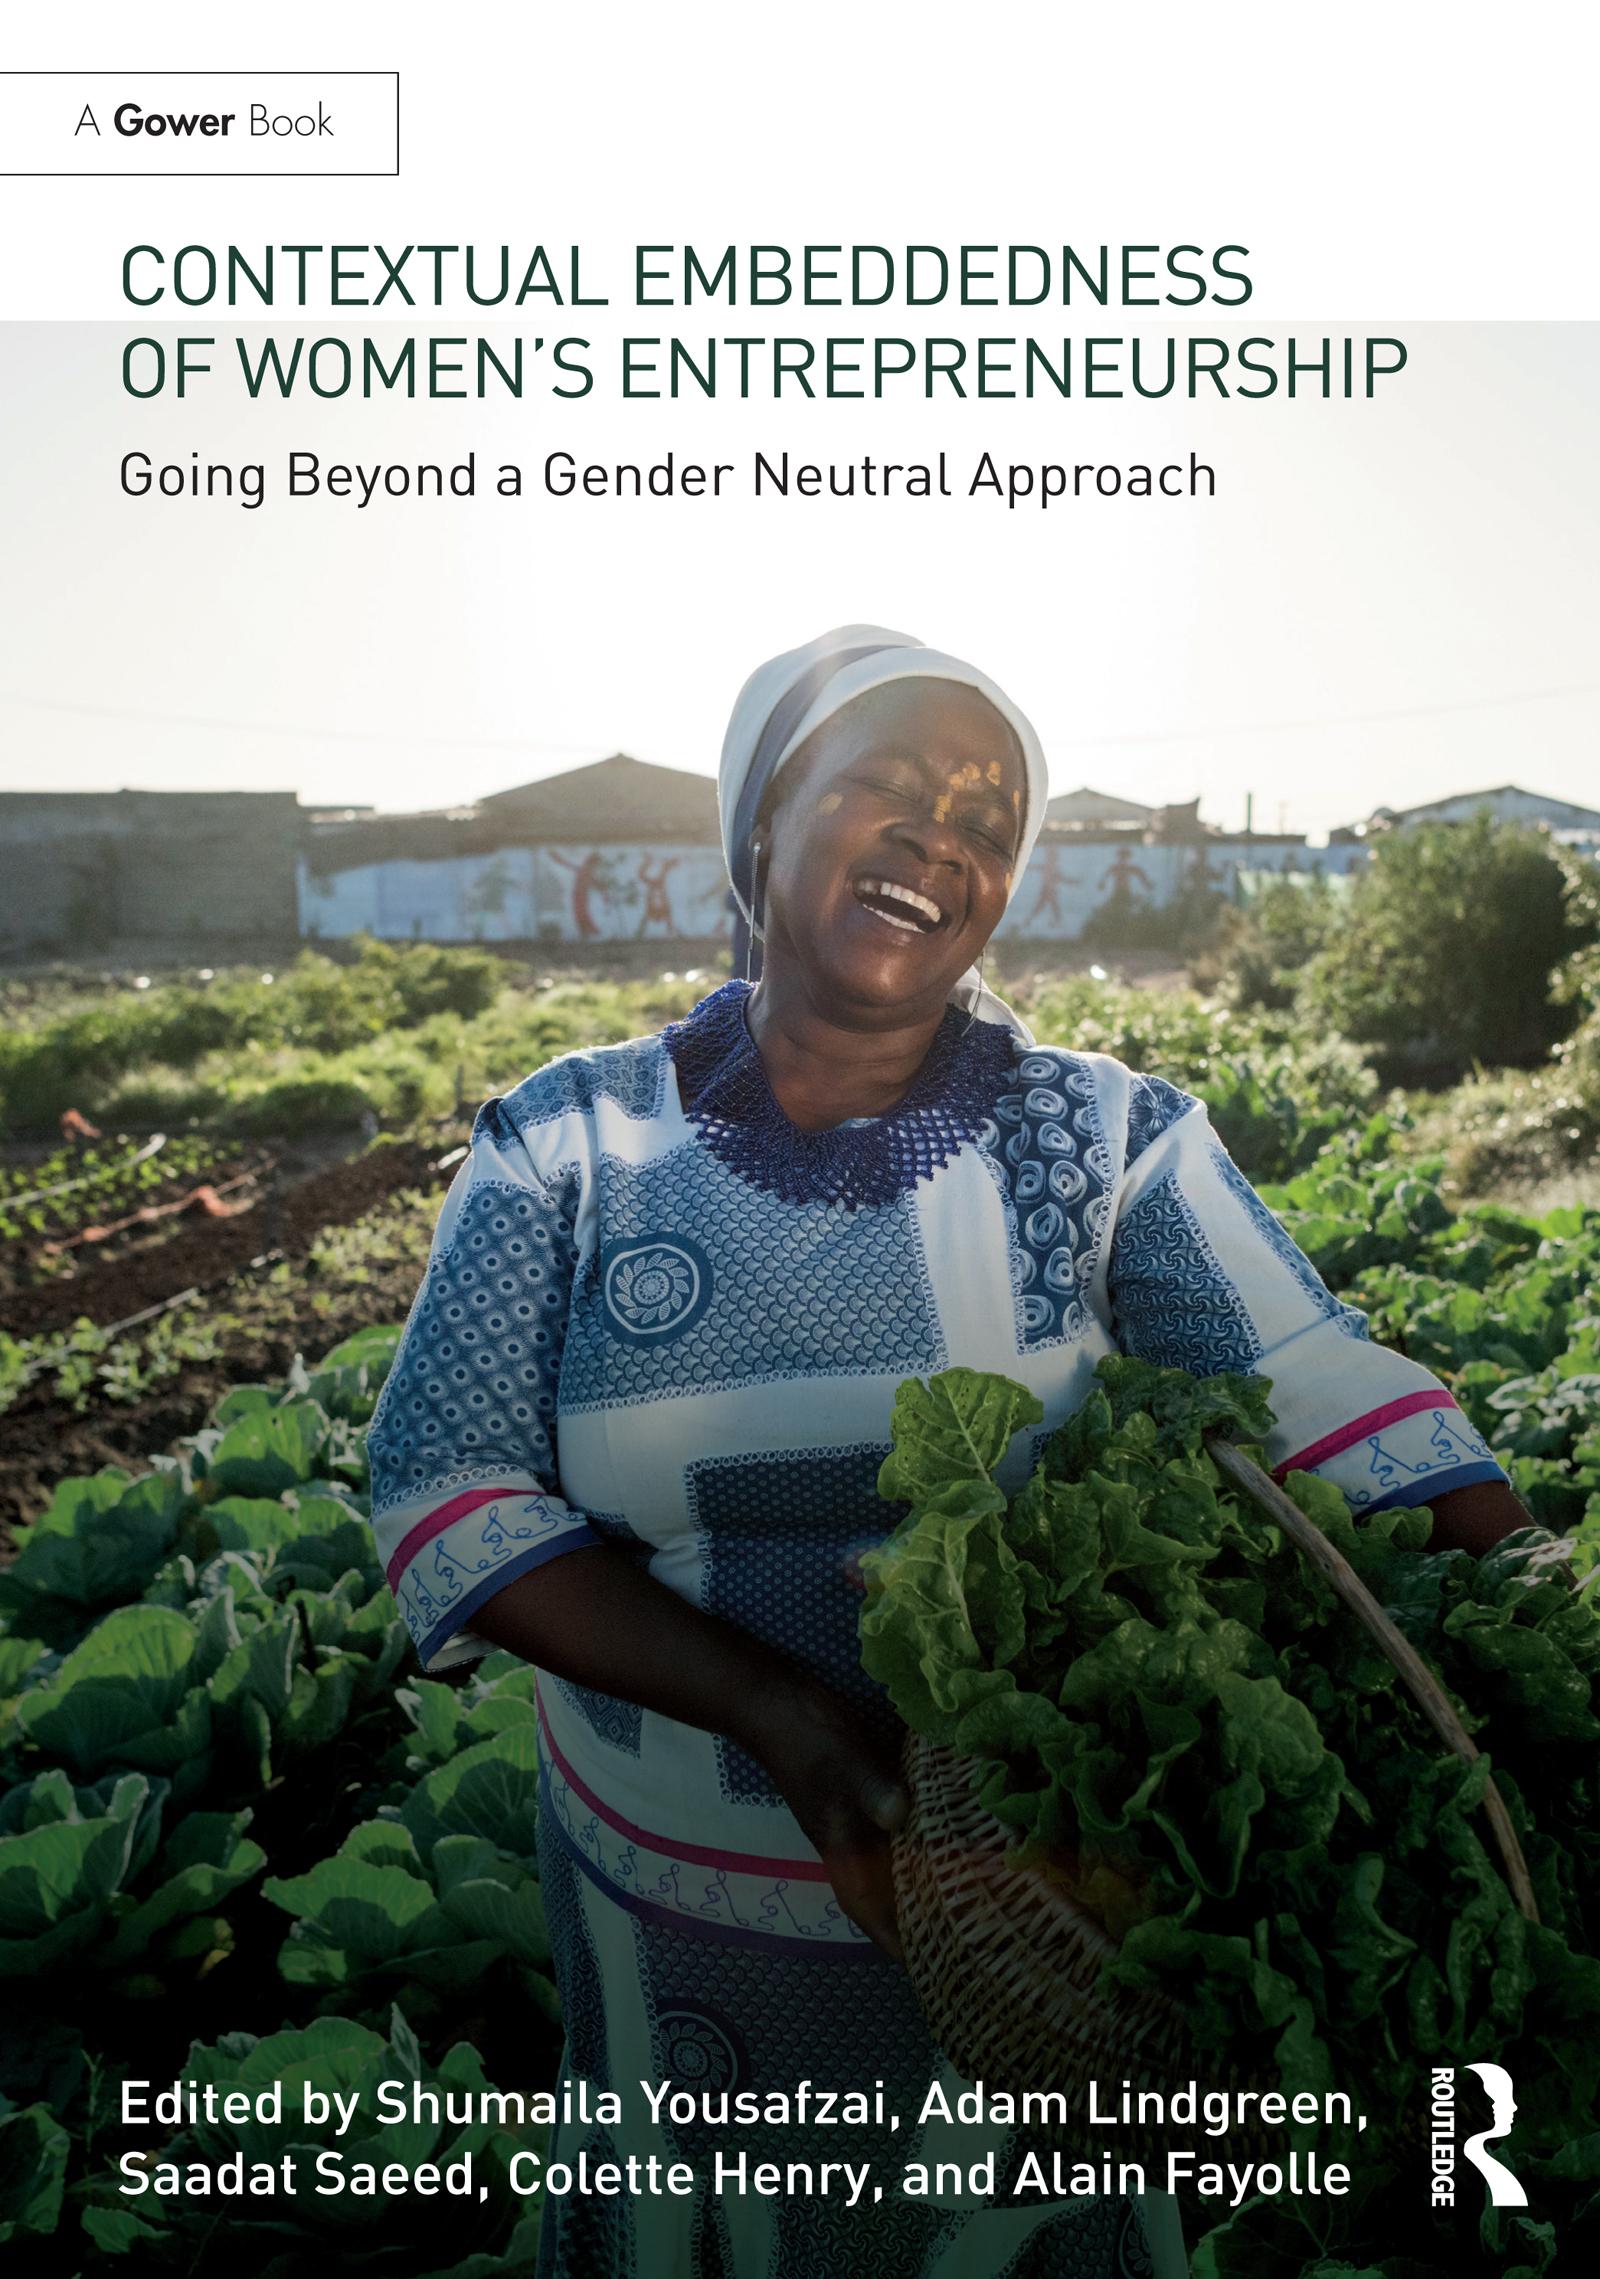 Contextual Embeddedness of Women's Entrepreneurship